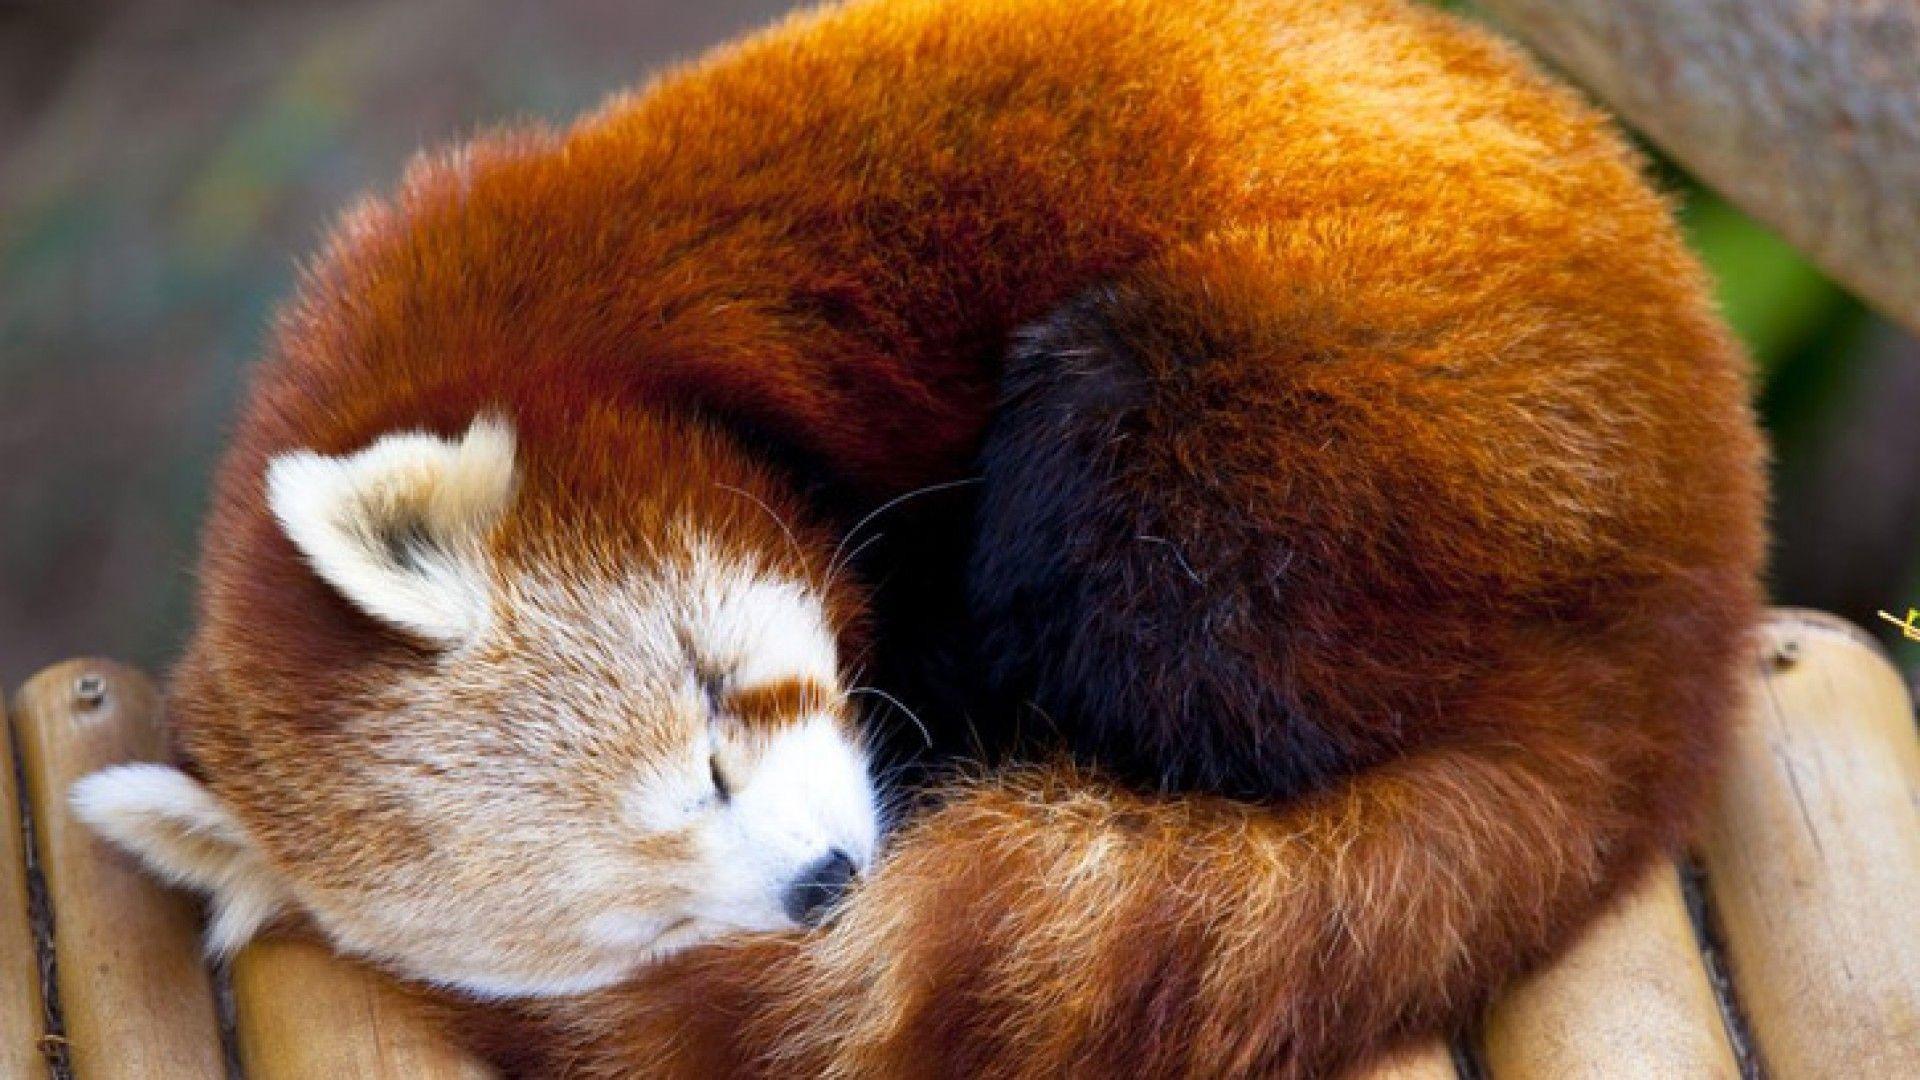 Red Panda Wallpaper 4 – Animal Backgrounds